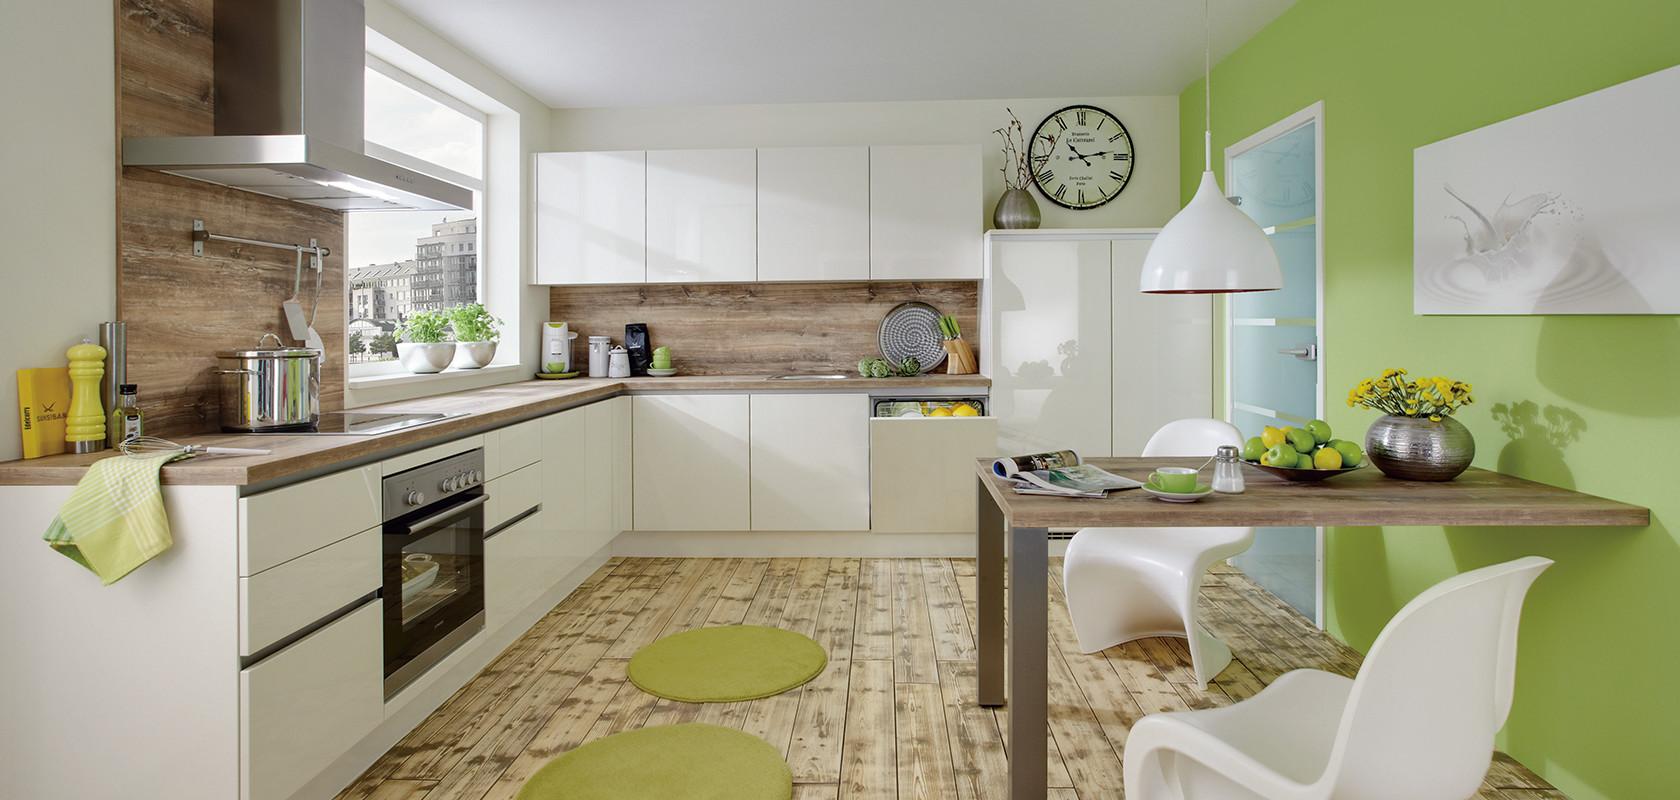 Глянцевая кухня без ручек Lux, nobilia